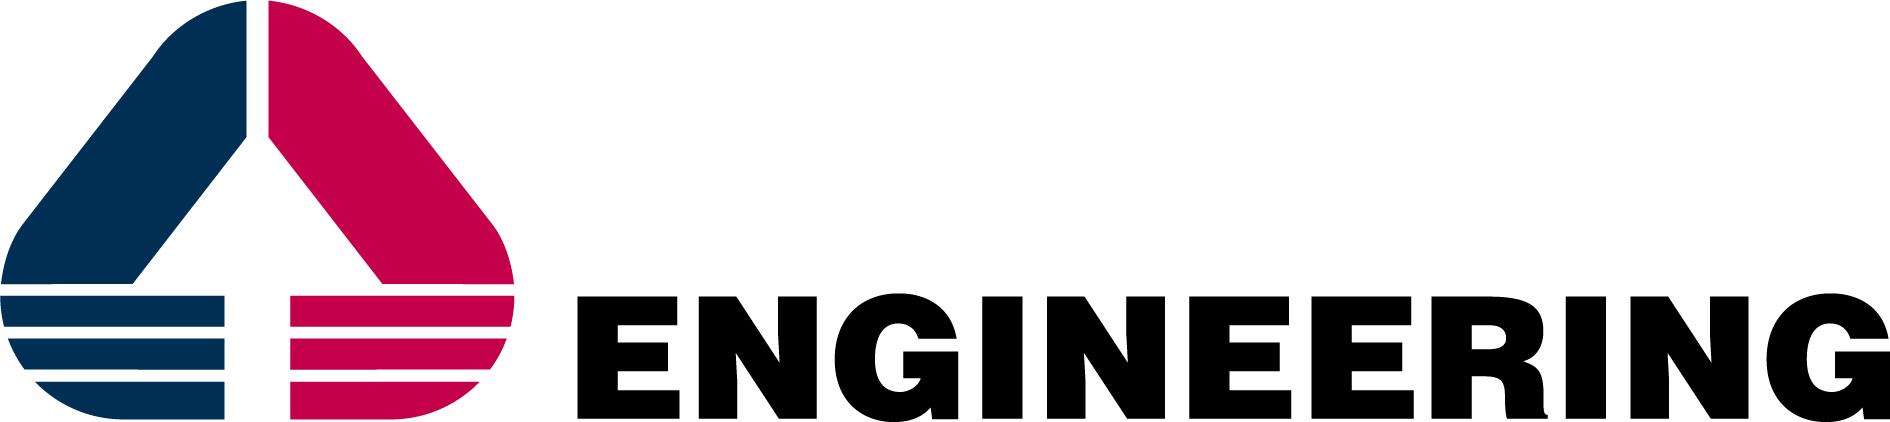 Engineering_logo.png